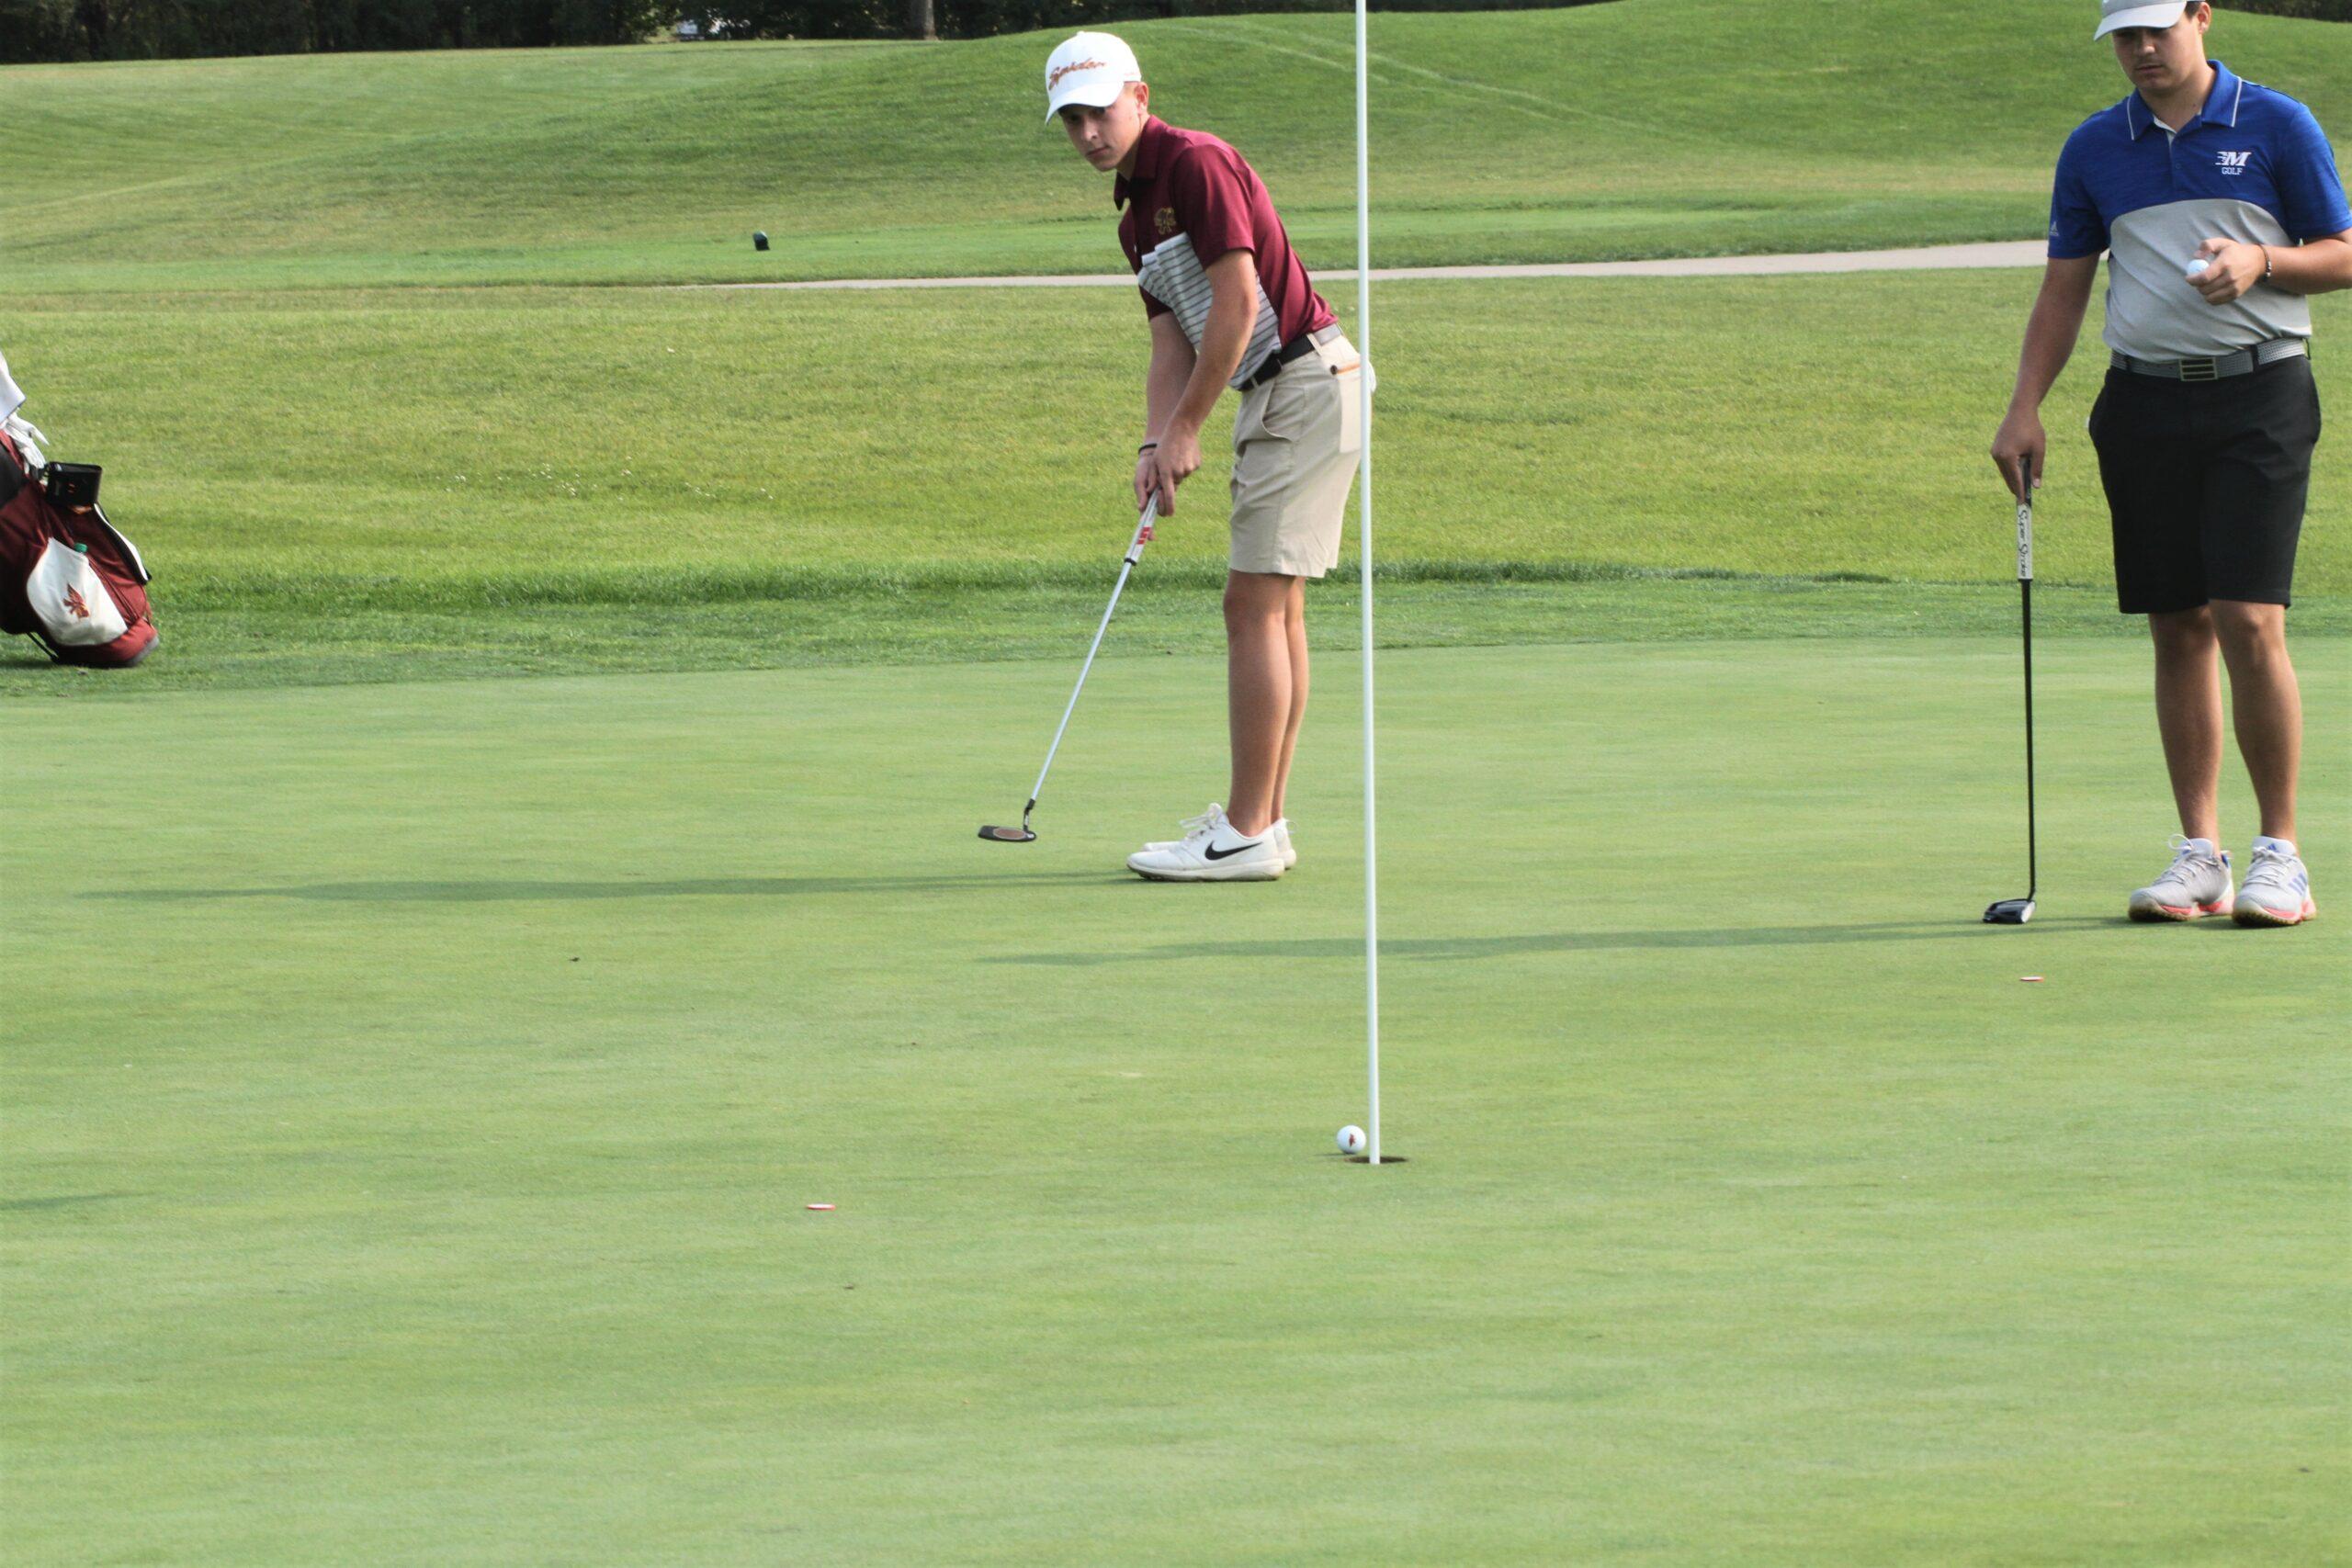 Hawk golfers top Marshalltown by 14 shots, claim 2nd straight dual-meet title